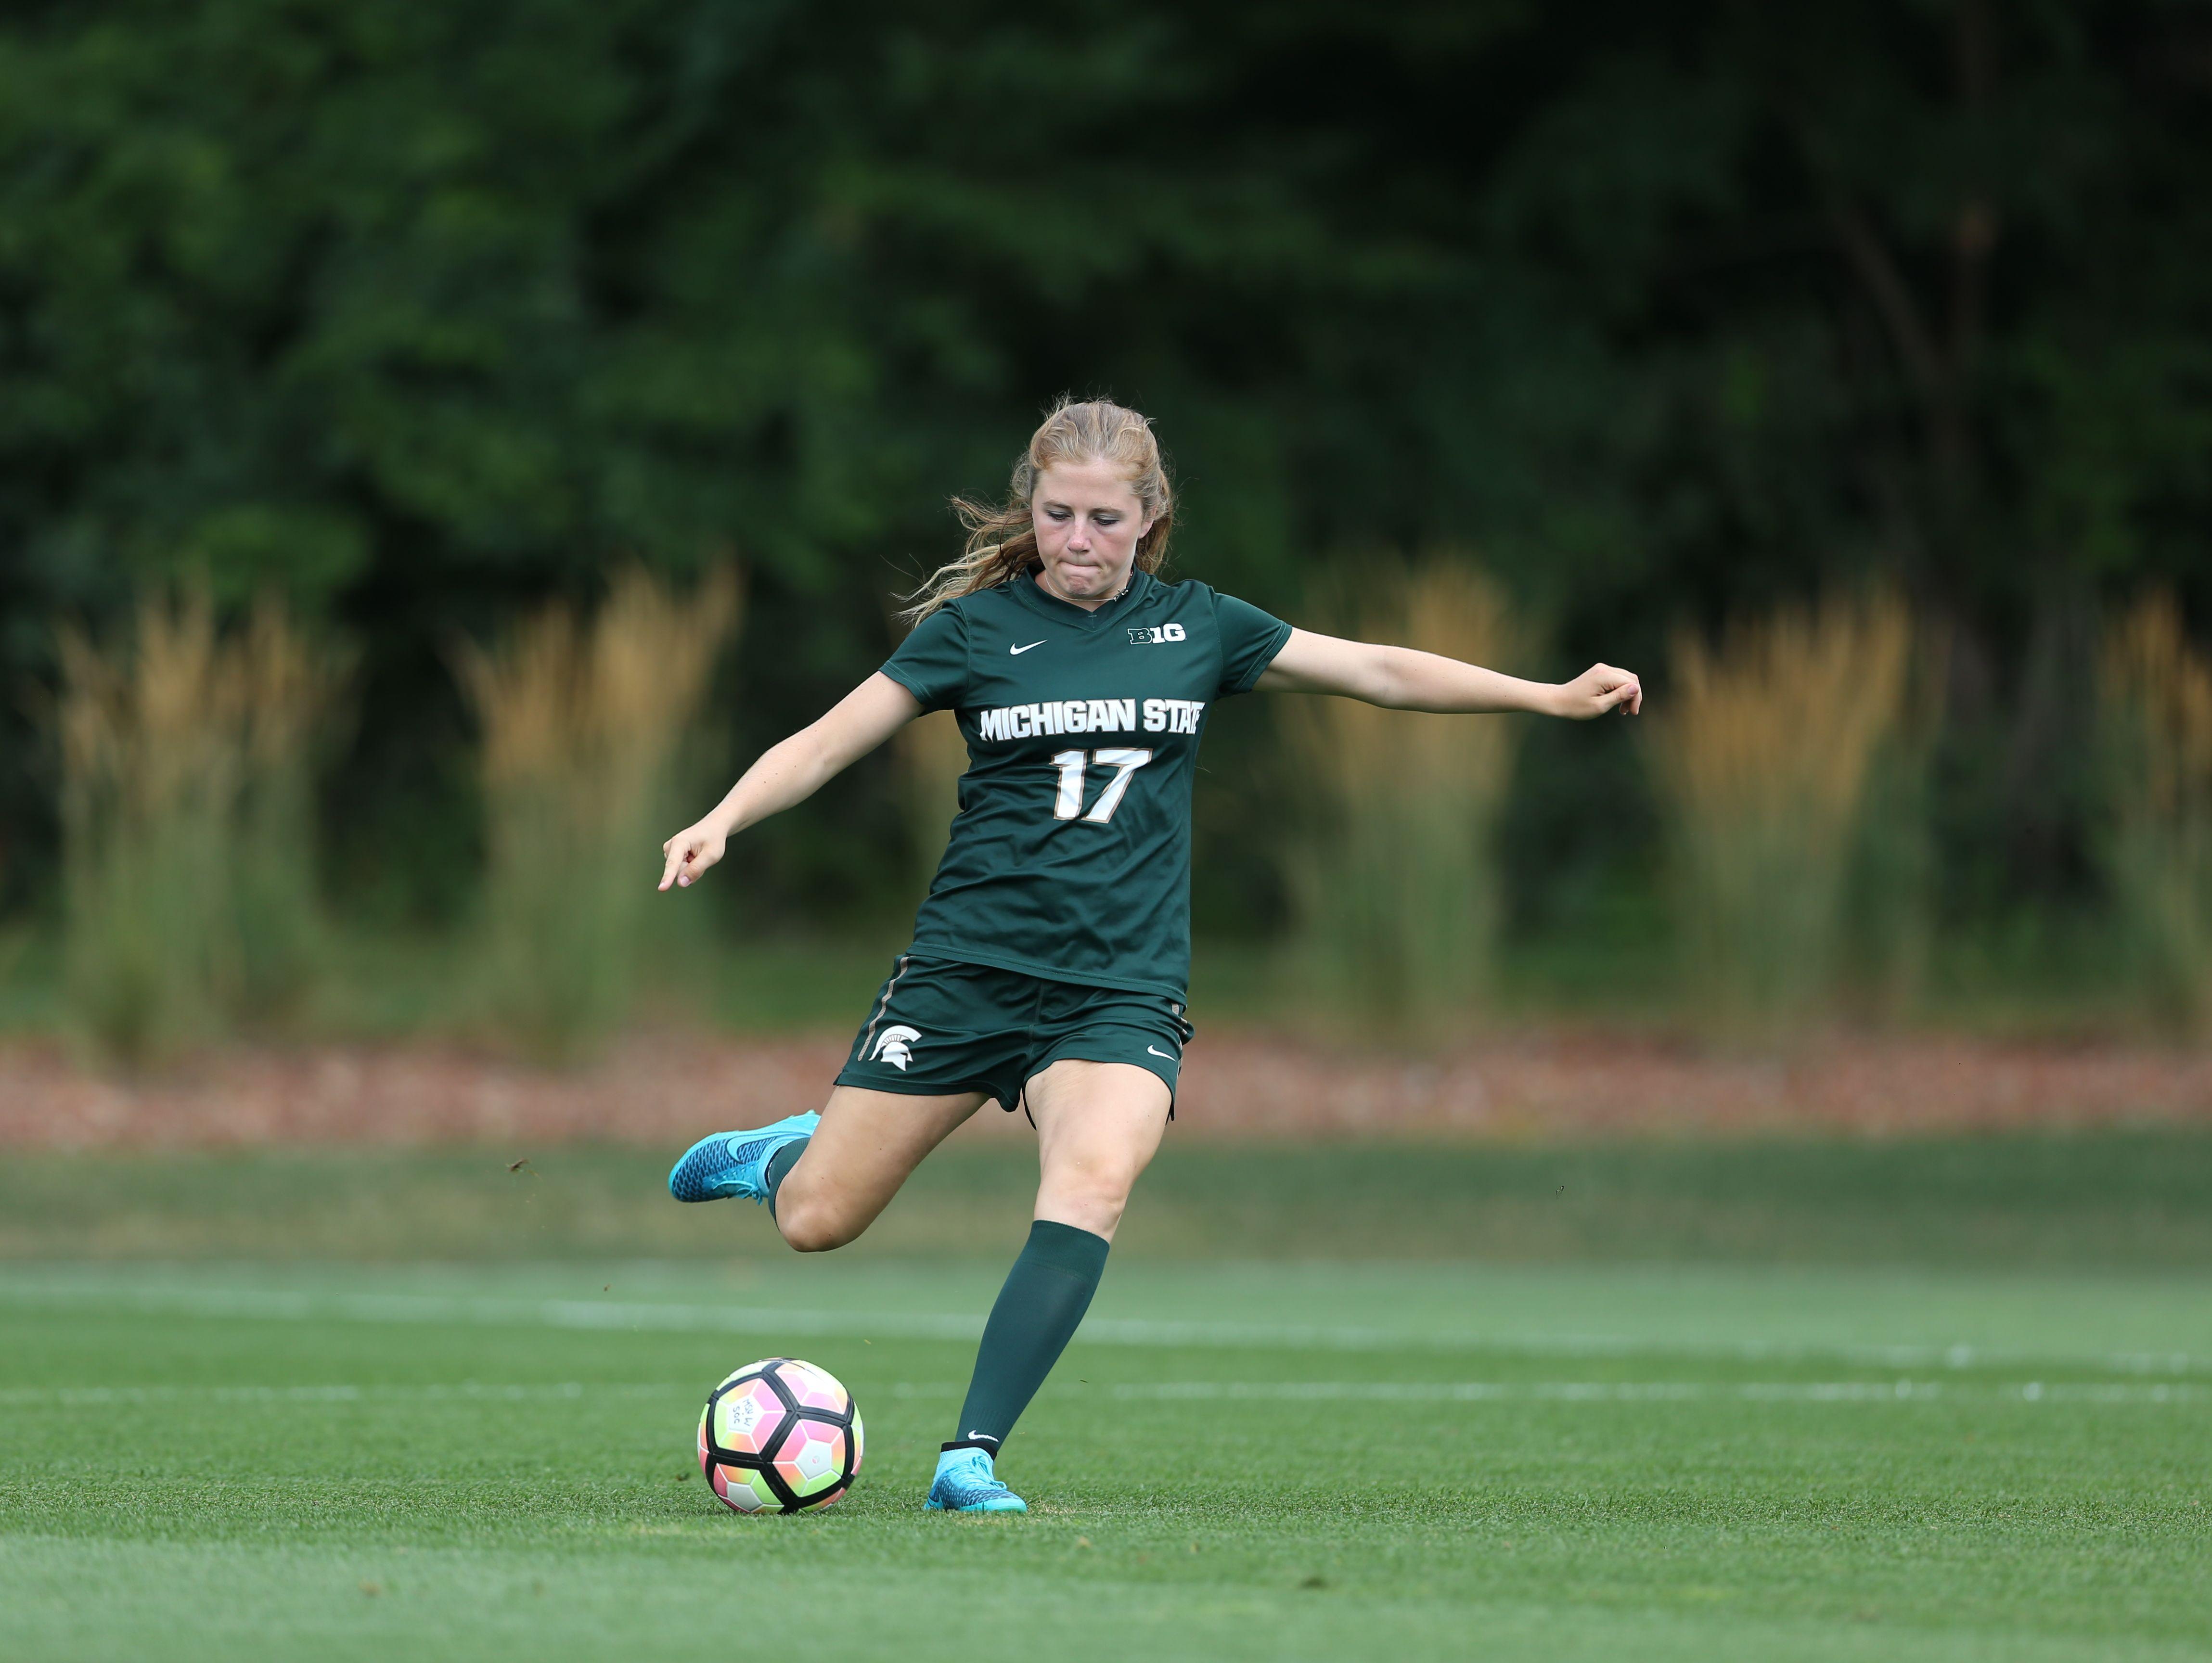 Port Huron Northern alumna Hannah Jones kicks the ball for Michigan State at DeMartin Soccer Stadium.